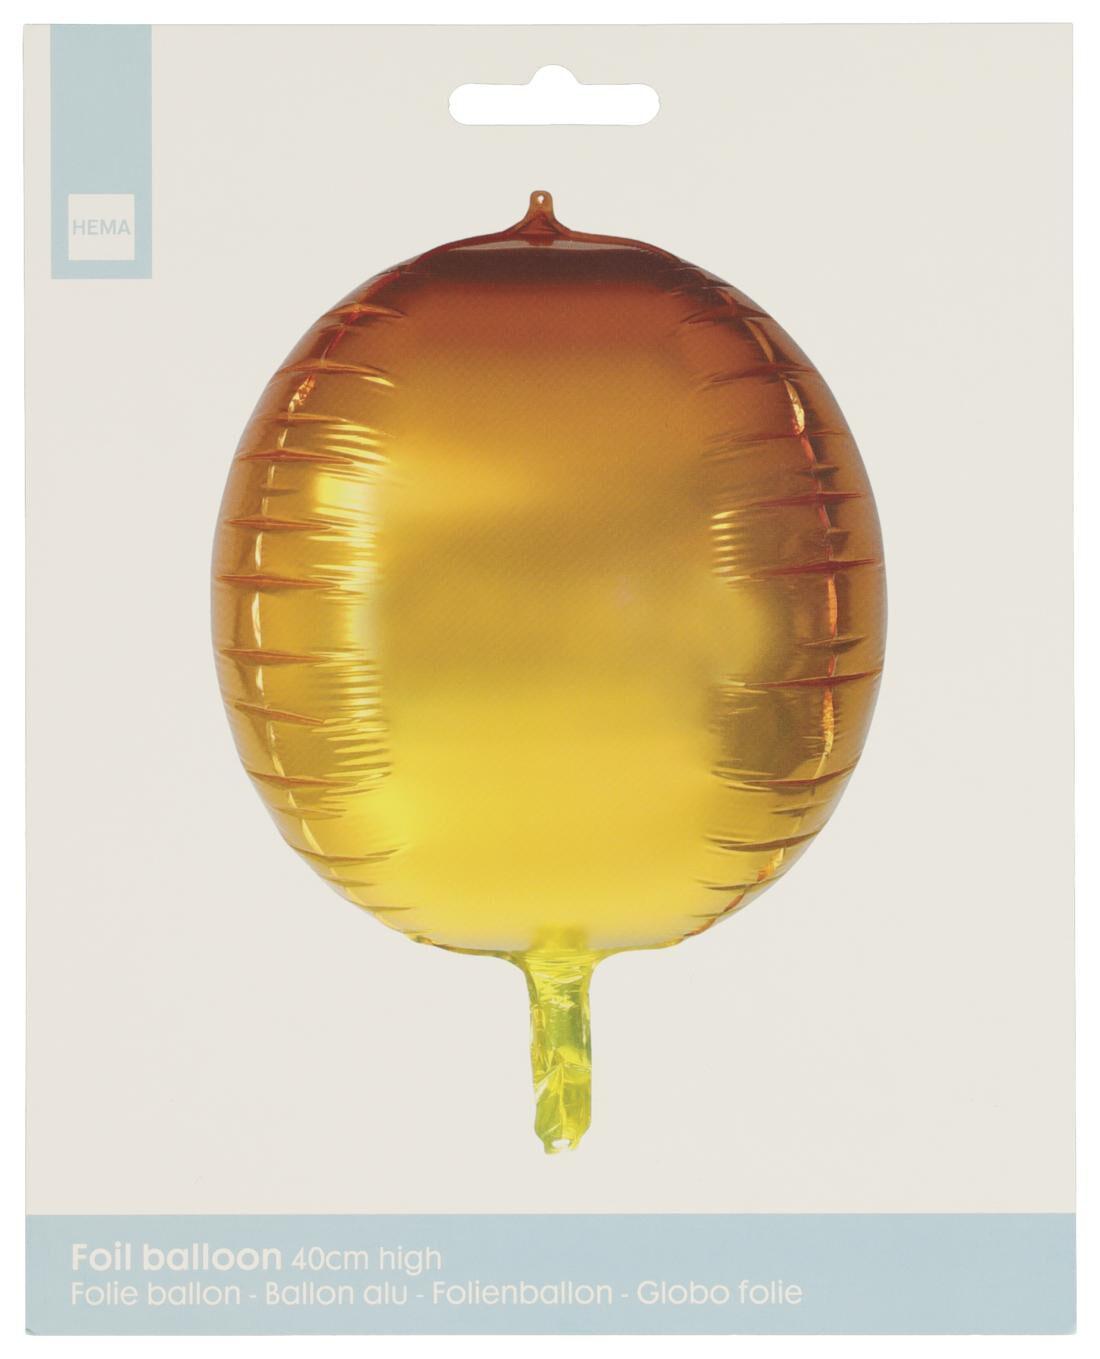 HEMA Folieballon 40 Cm